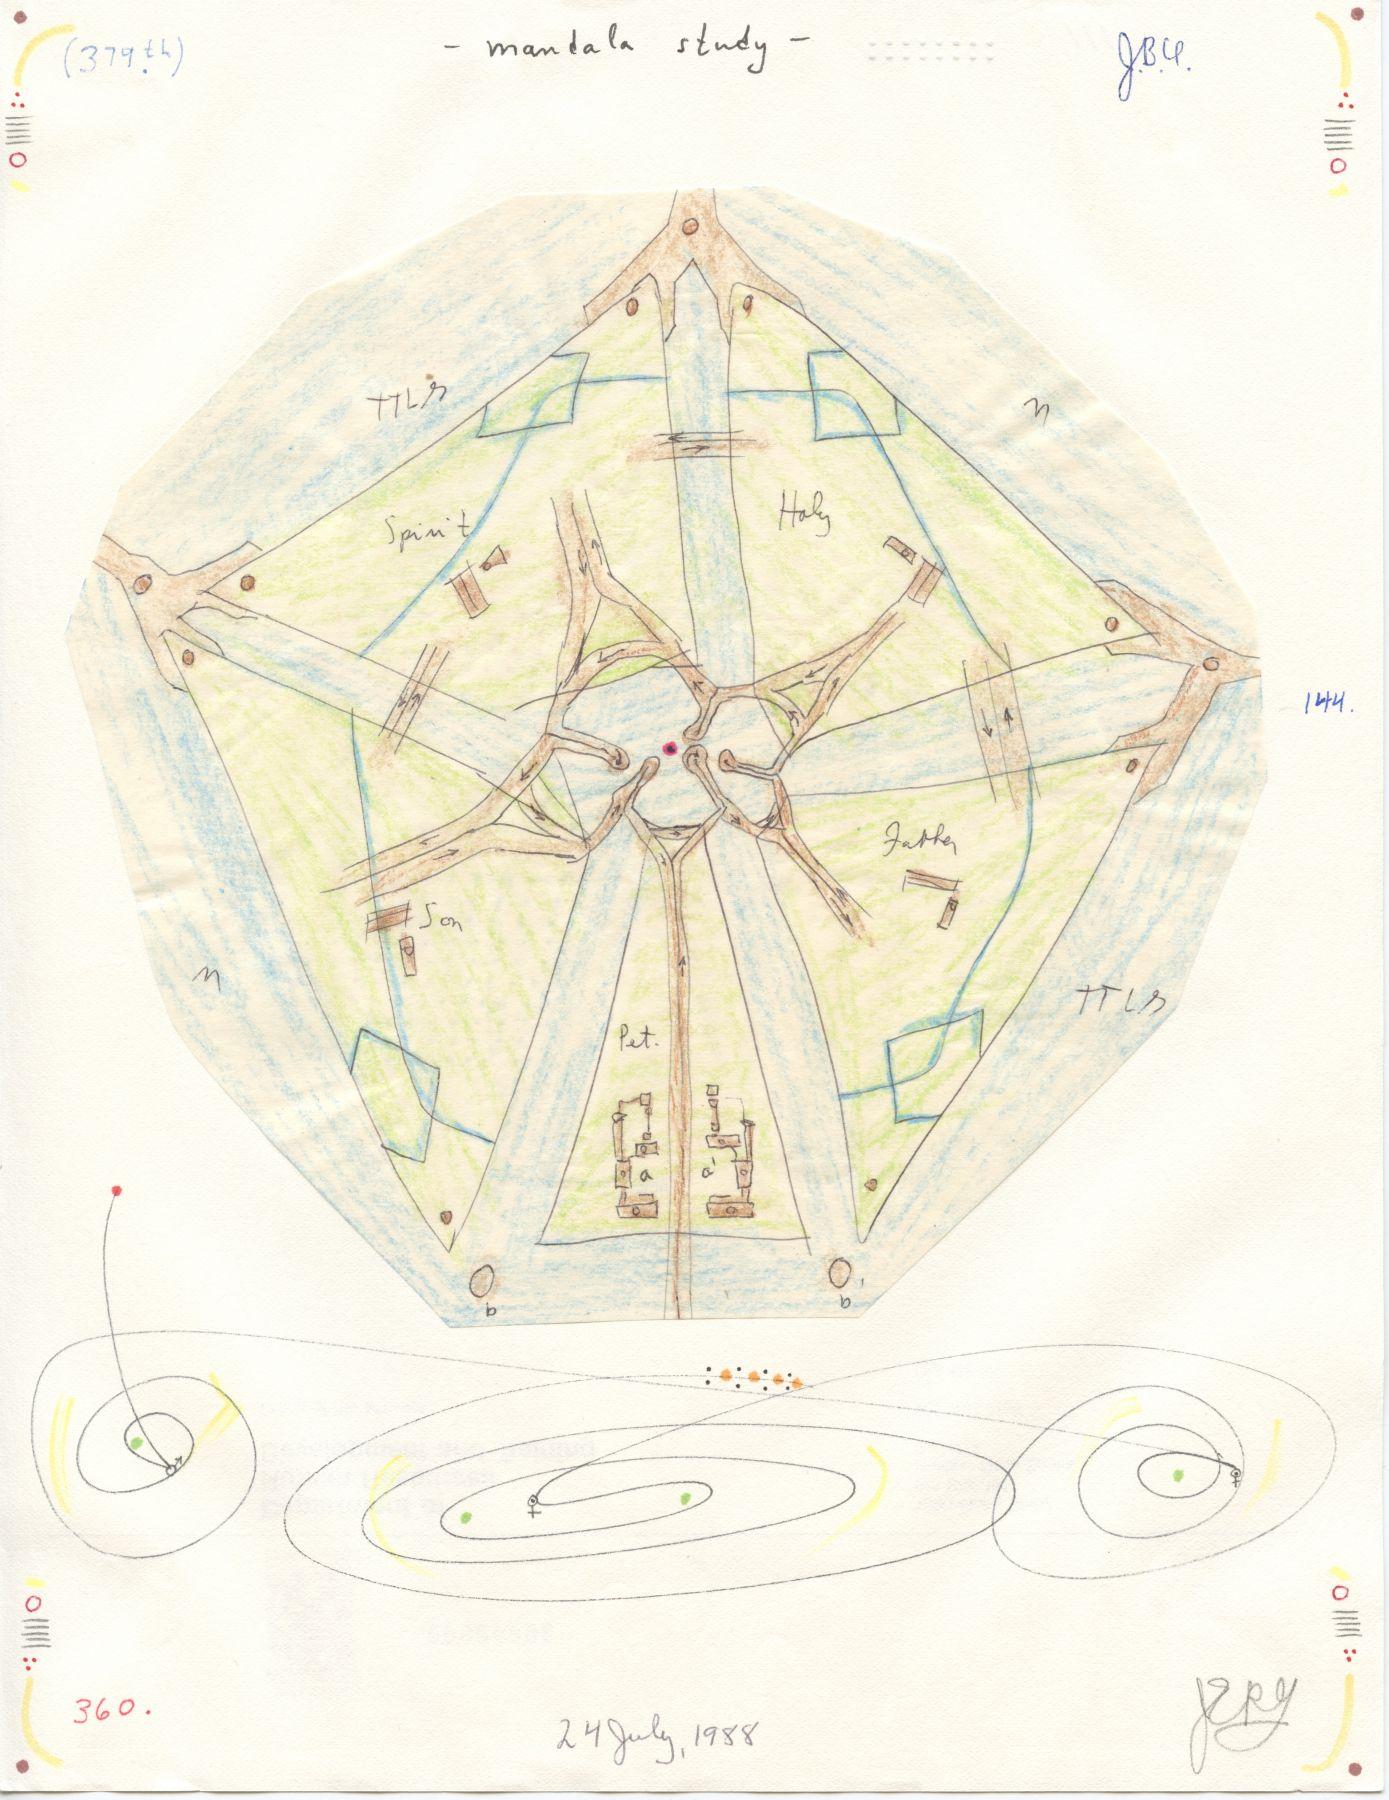 John Devlin(1954) Canada, Study, circular utopia, Nova Scotia, 1988, Mixed media on paper, 11x 8.5in